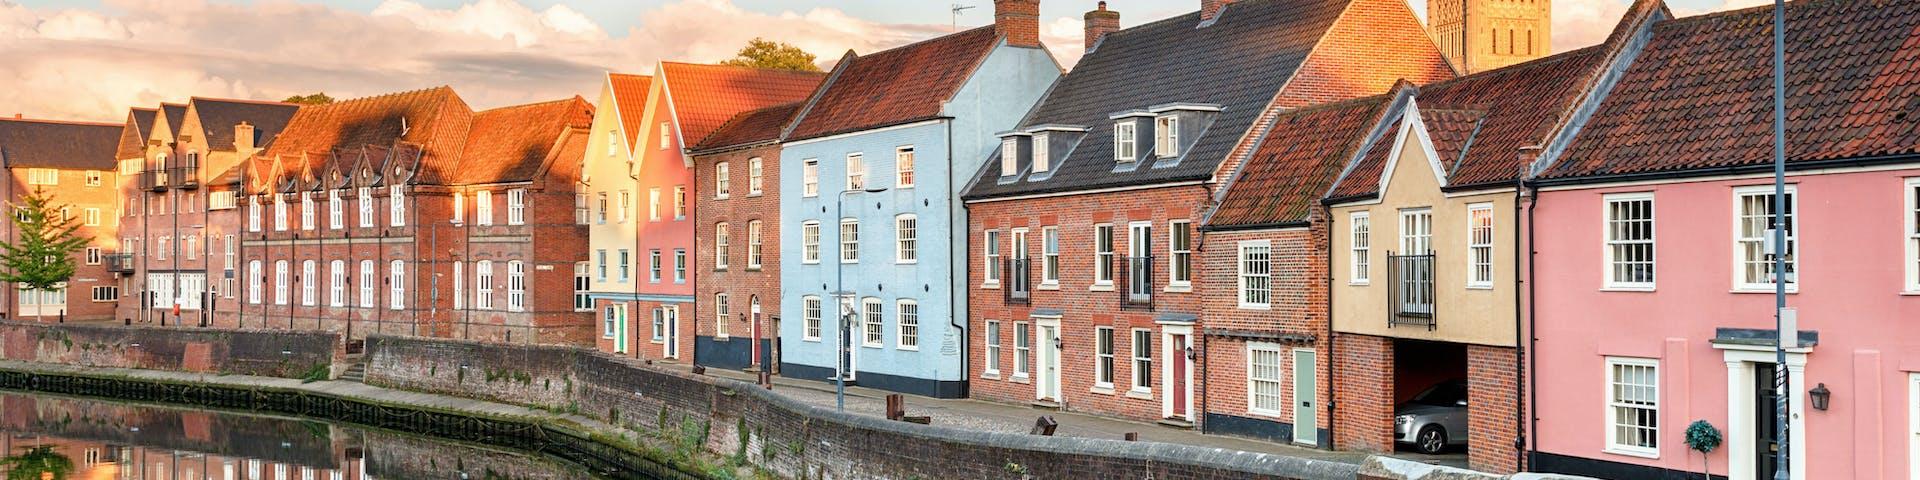 Bachelors degree in Norwich - United Kingdom ...